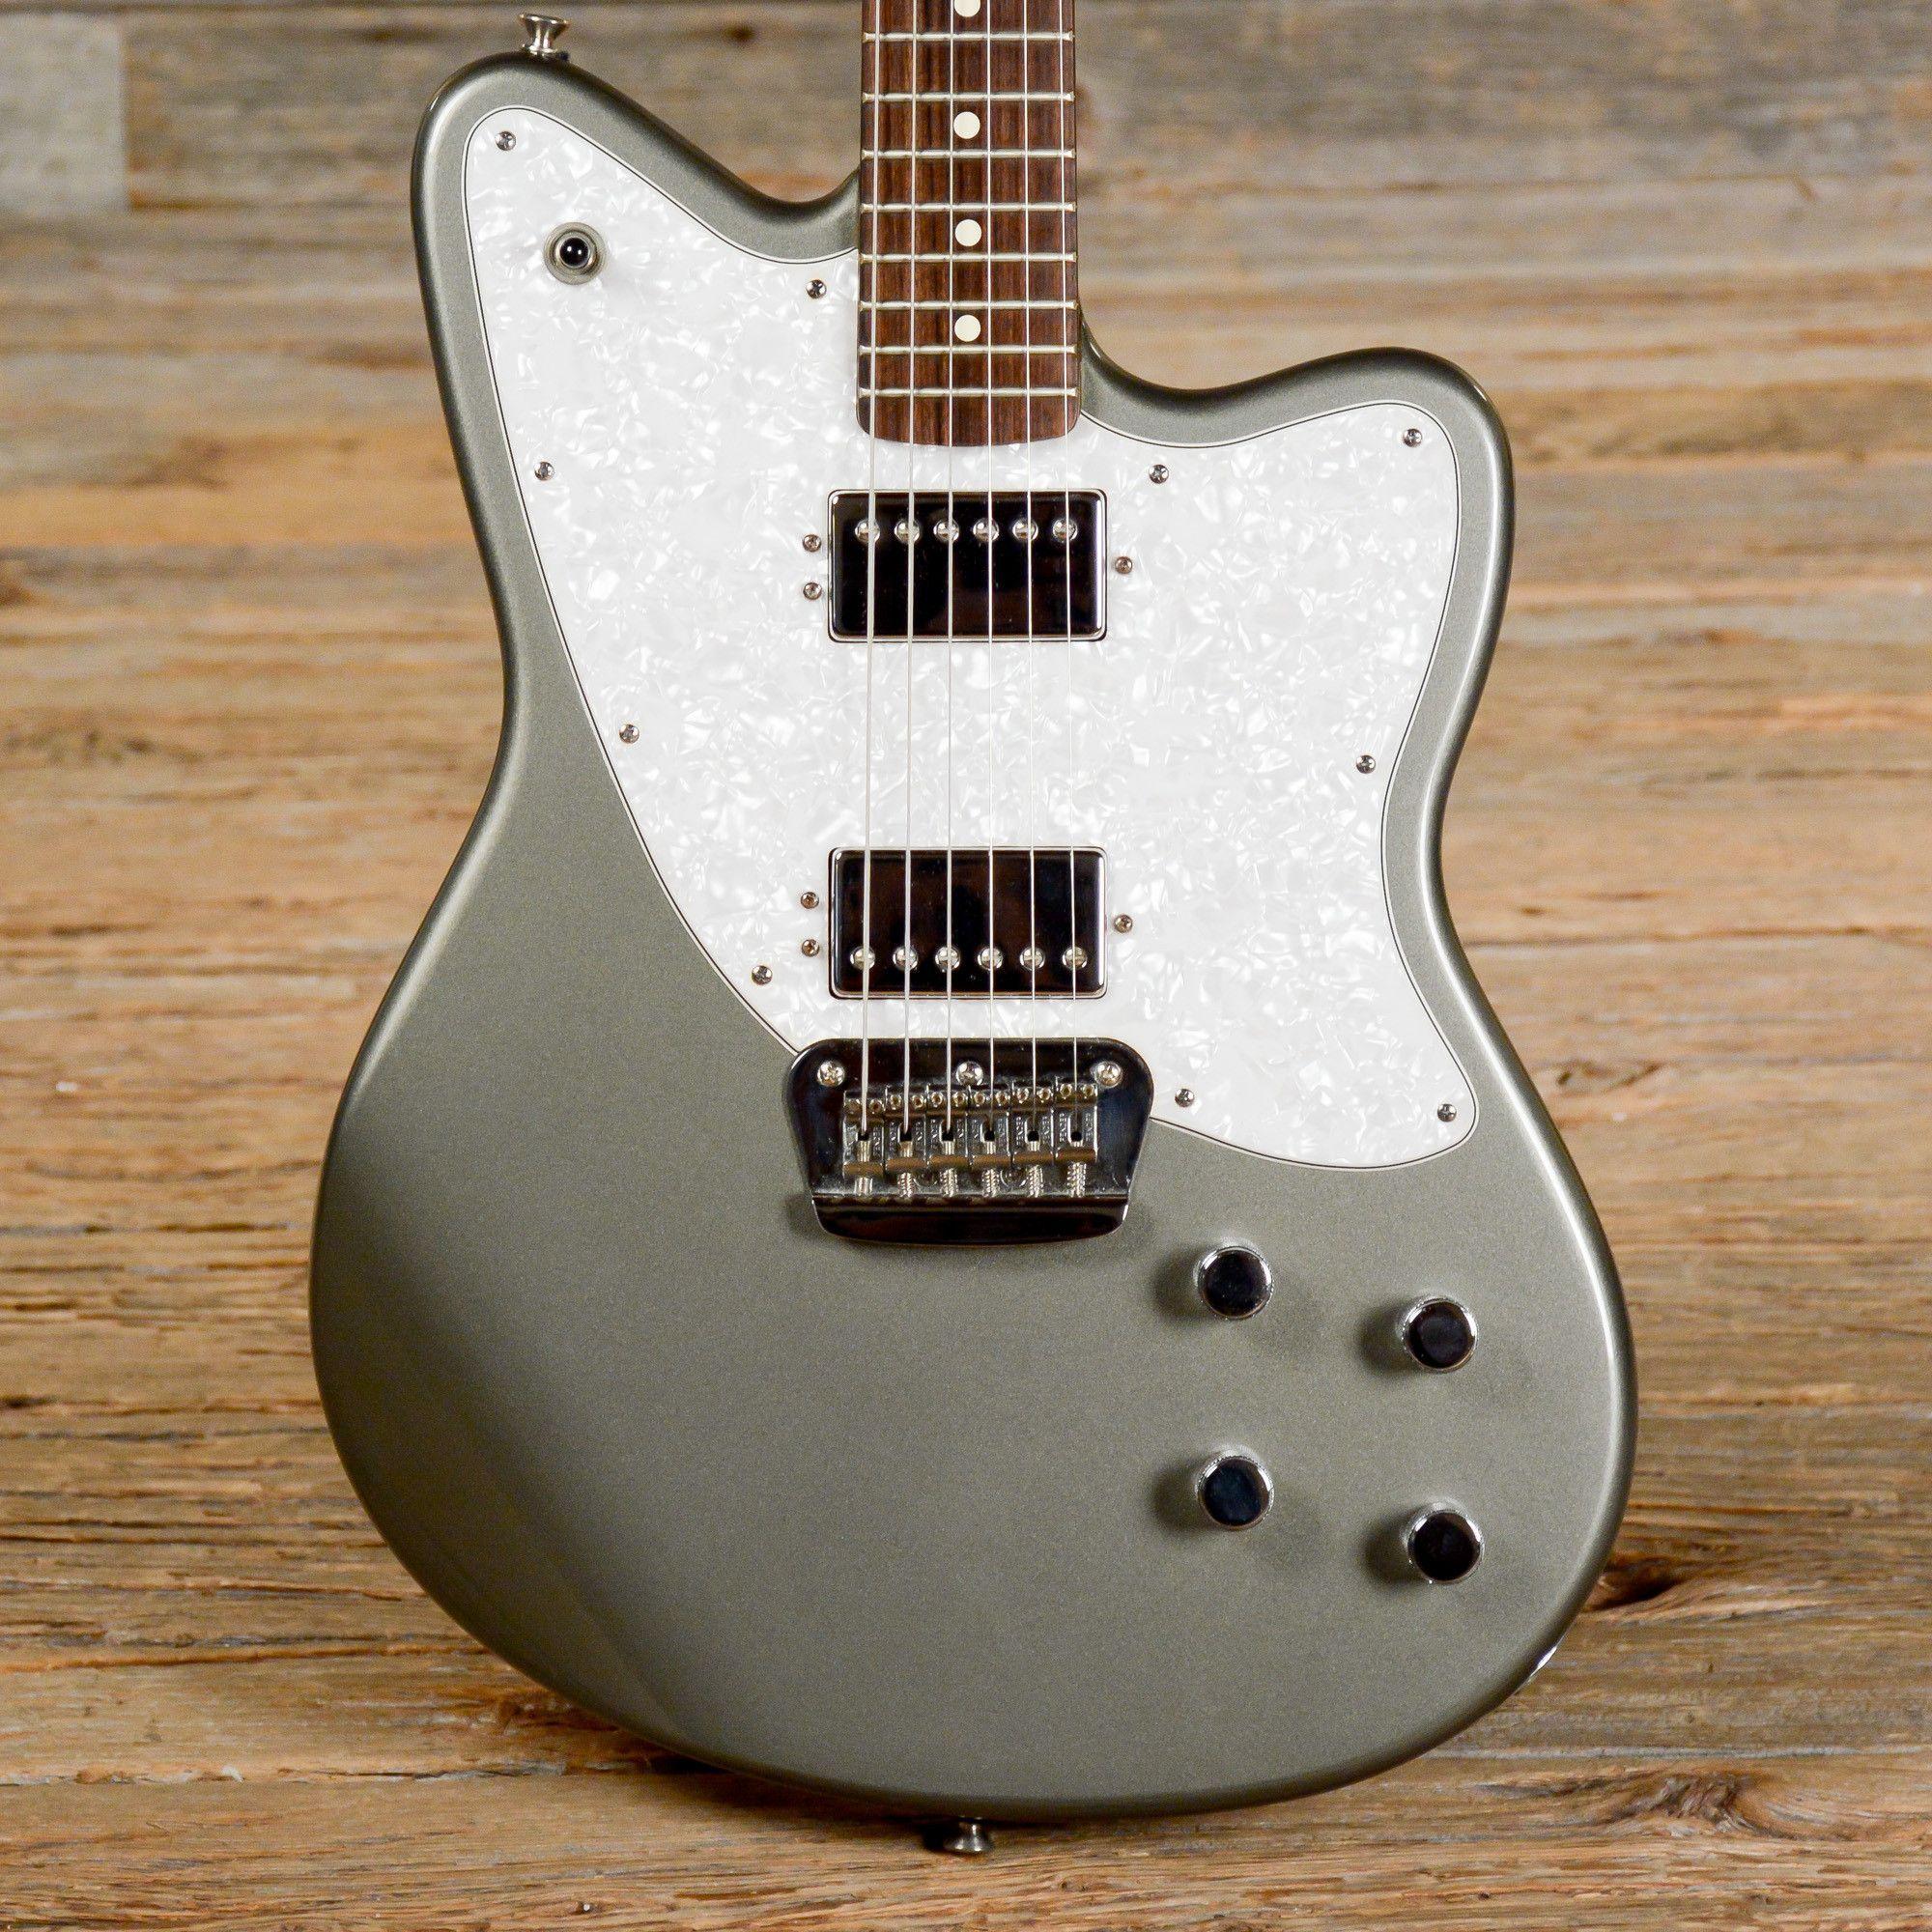 Fender toronado pewter 2002 s751 fender guitars pinterest fender toronado pewter 2002 s751 sciox Choice Image